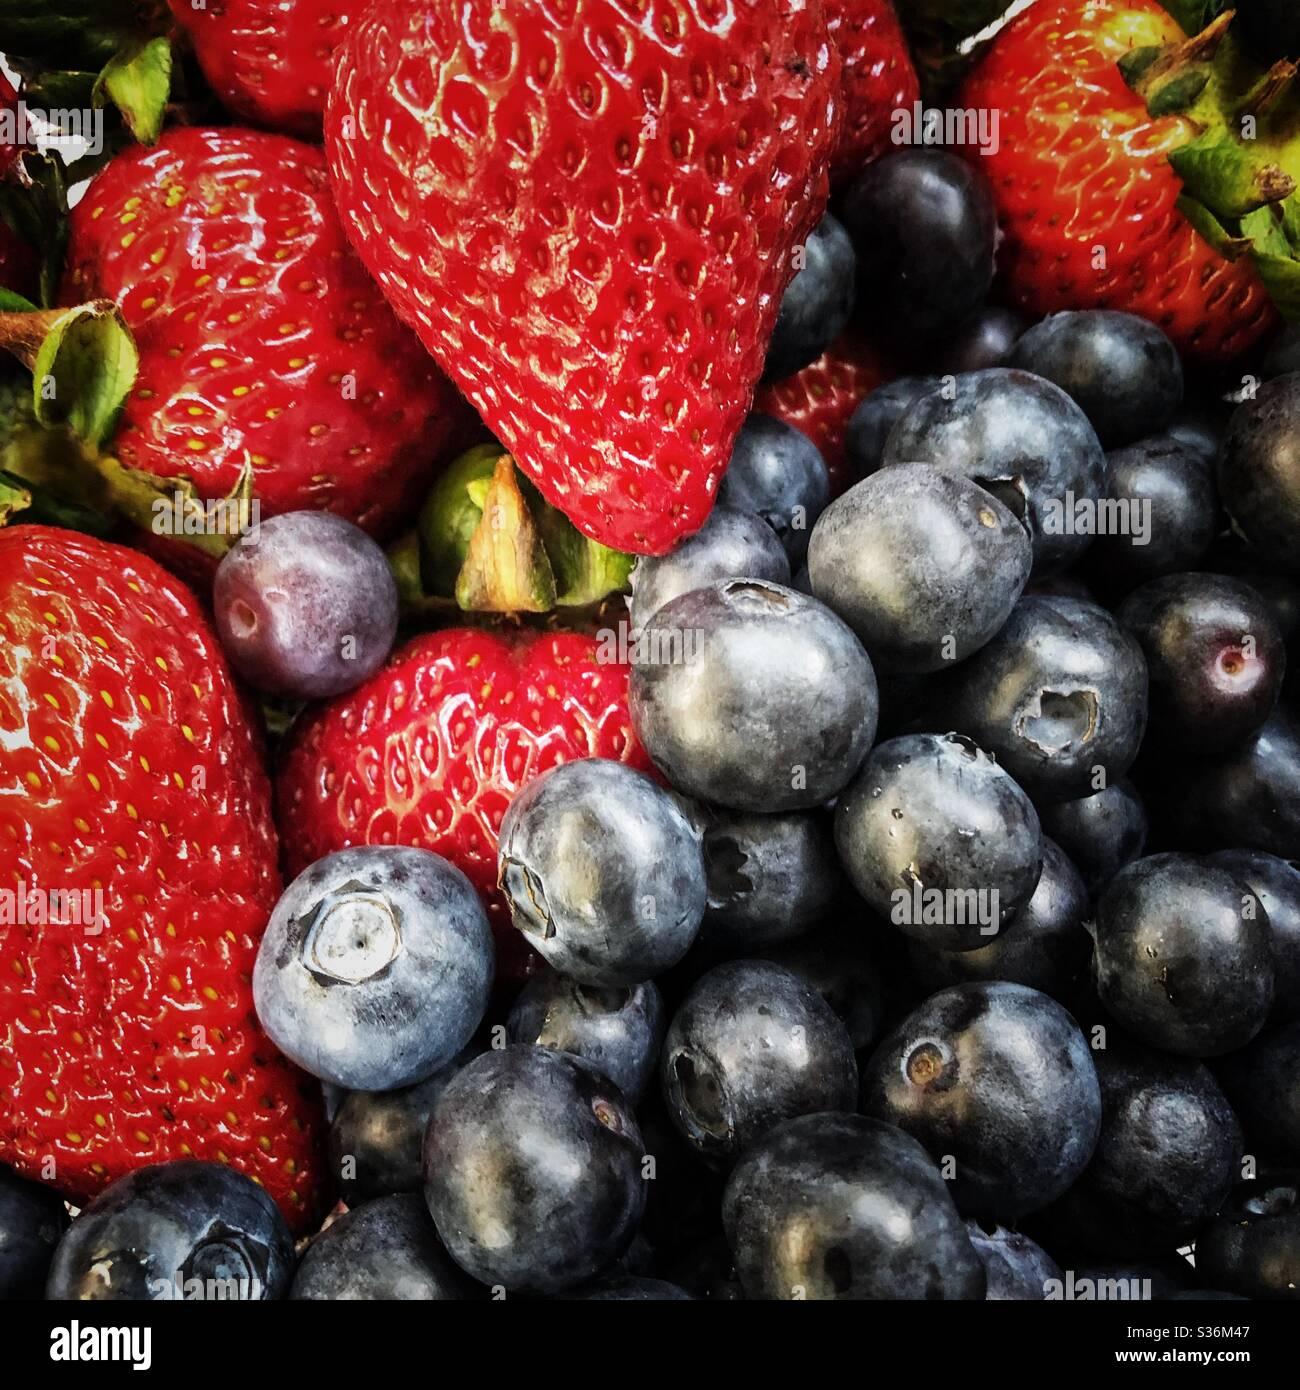 Berries! Stock Photo